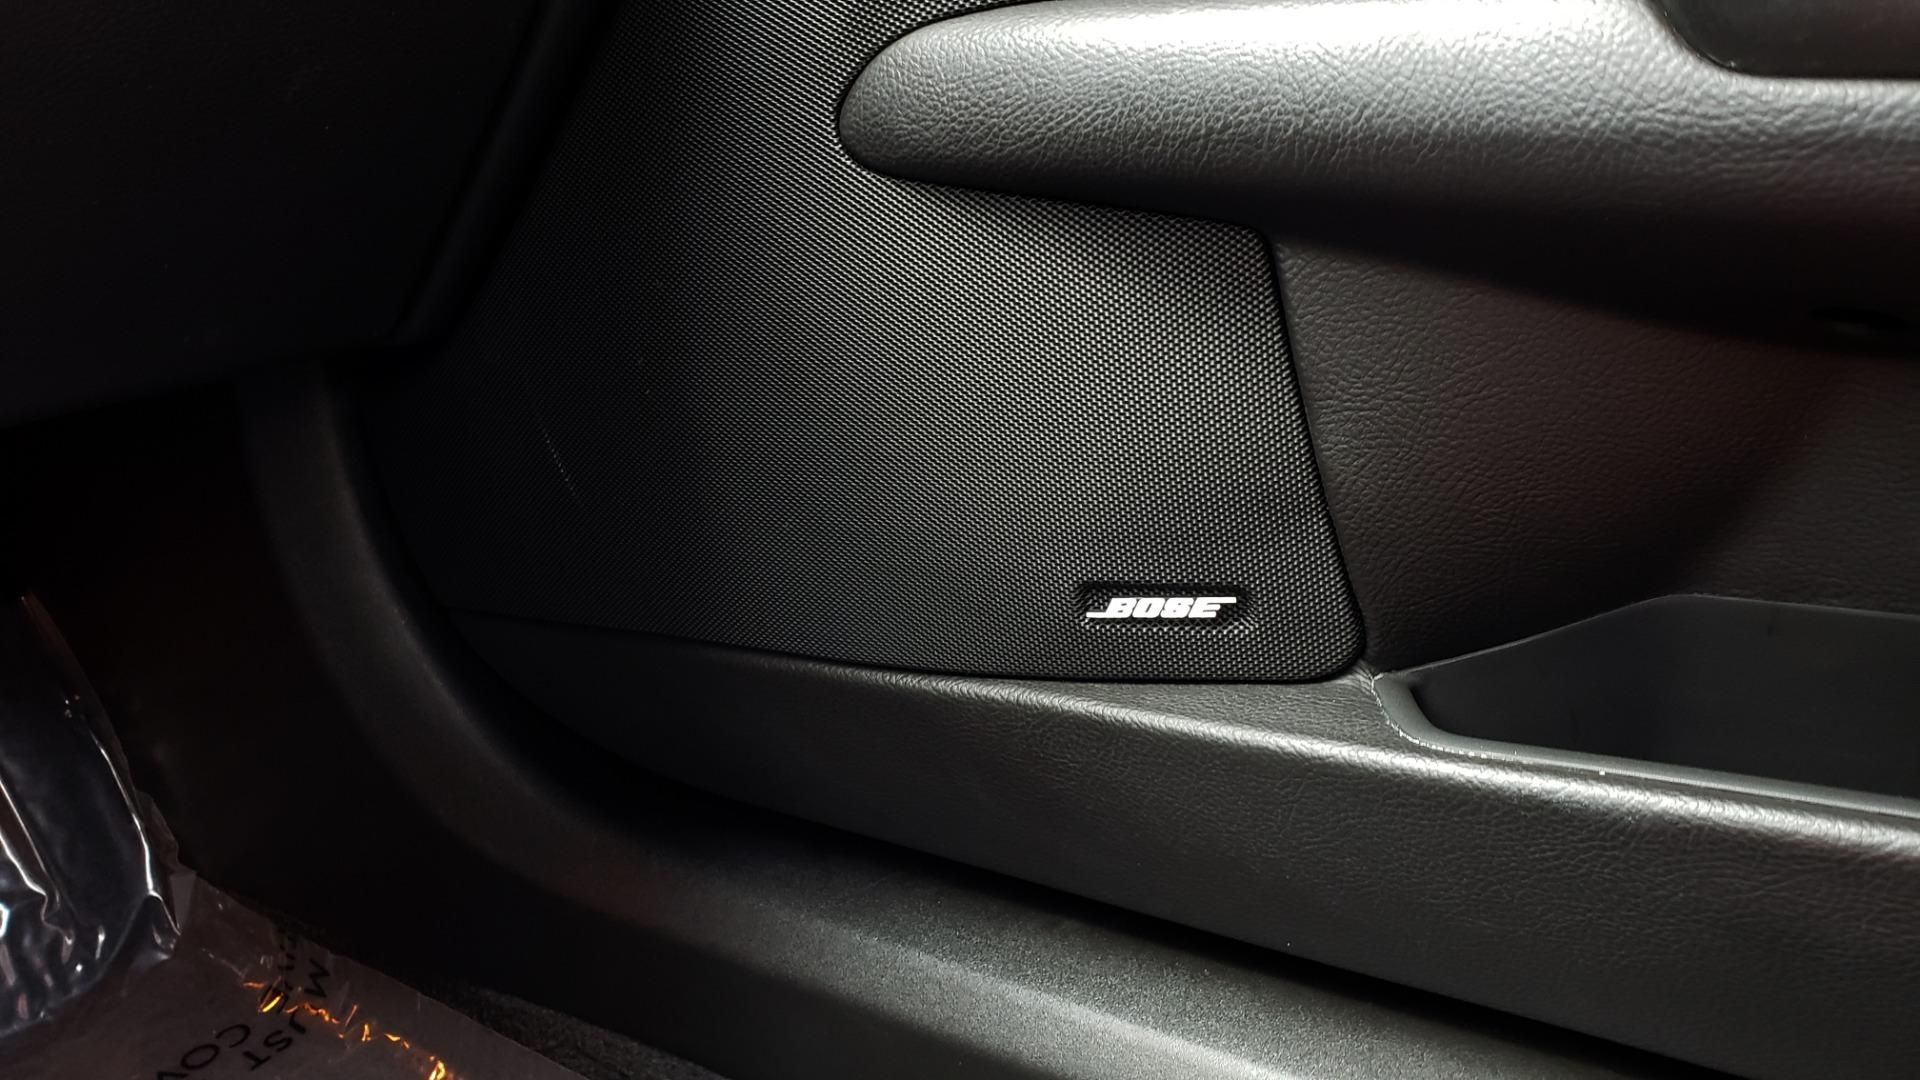 Used 2007 Chevrolet CORVETTE Z06 2LZ / 7.0L 427 V8 / 6-SPD MAN / BOSE / POLISHED WHEELS for sale Sold at Formula Imports in Charlotte NC 28227 92